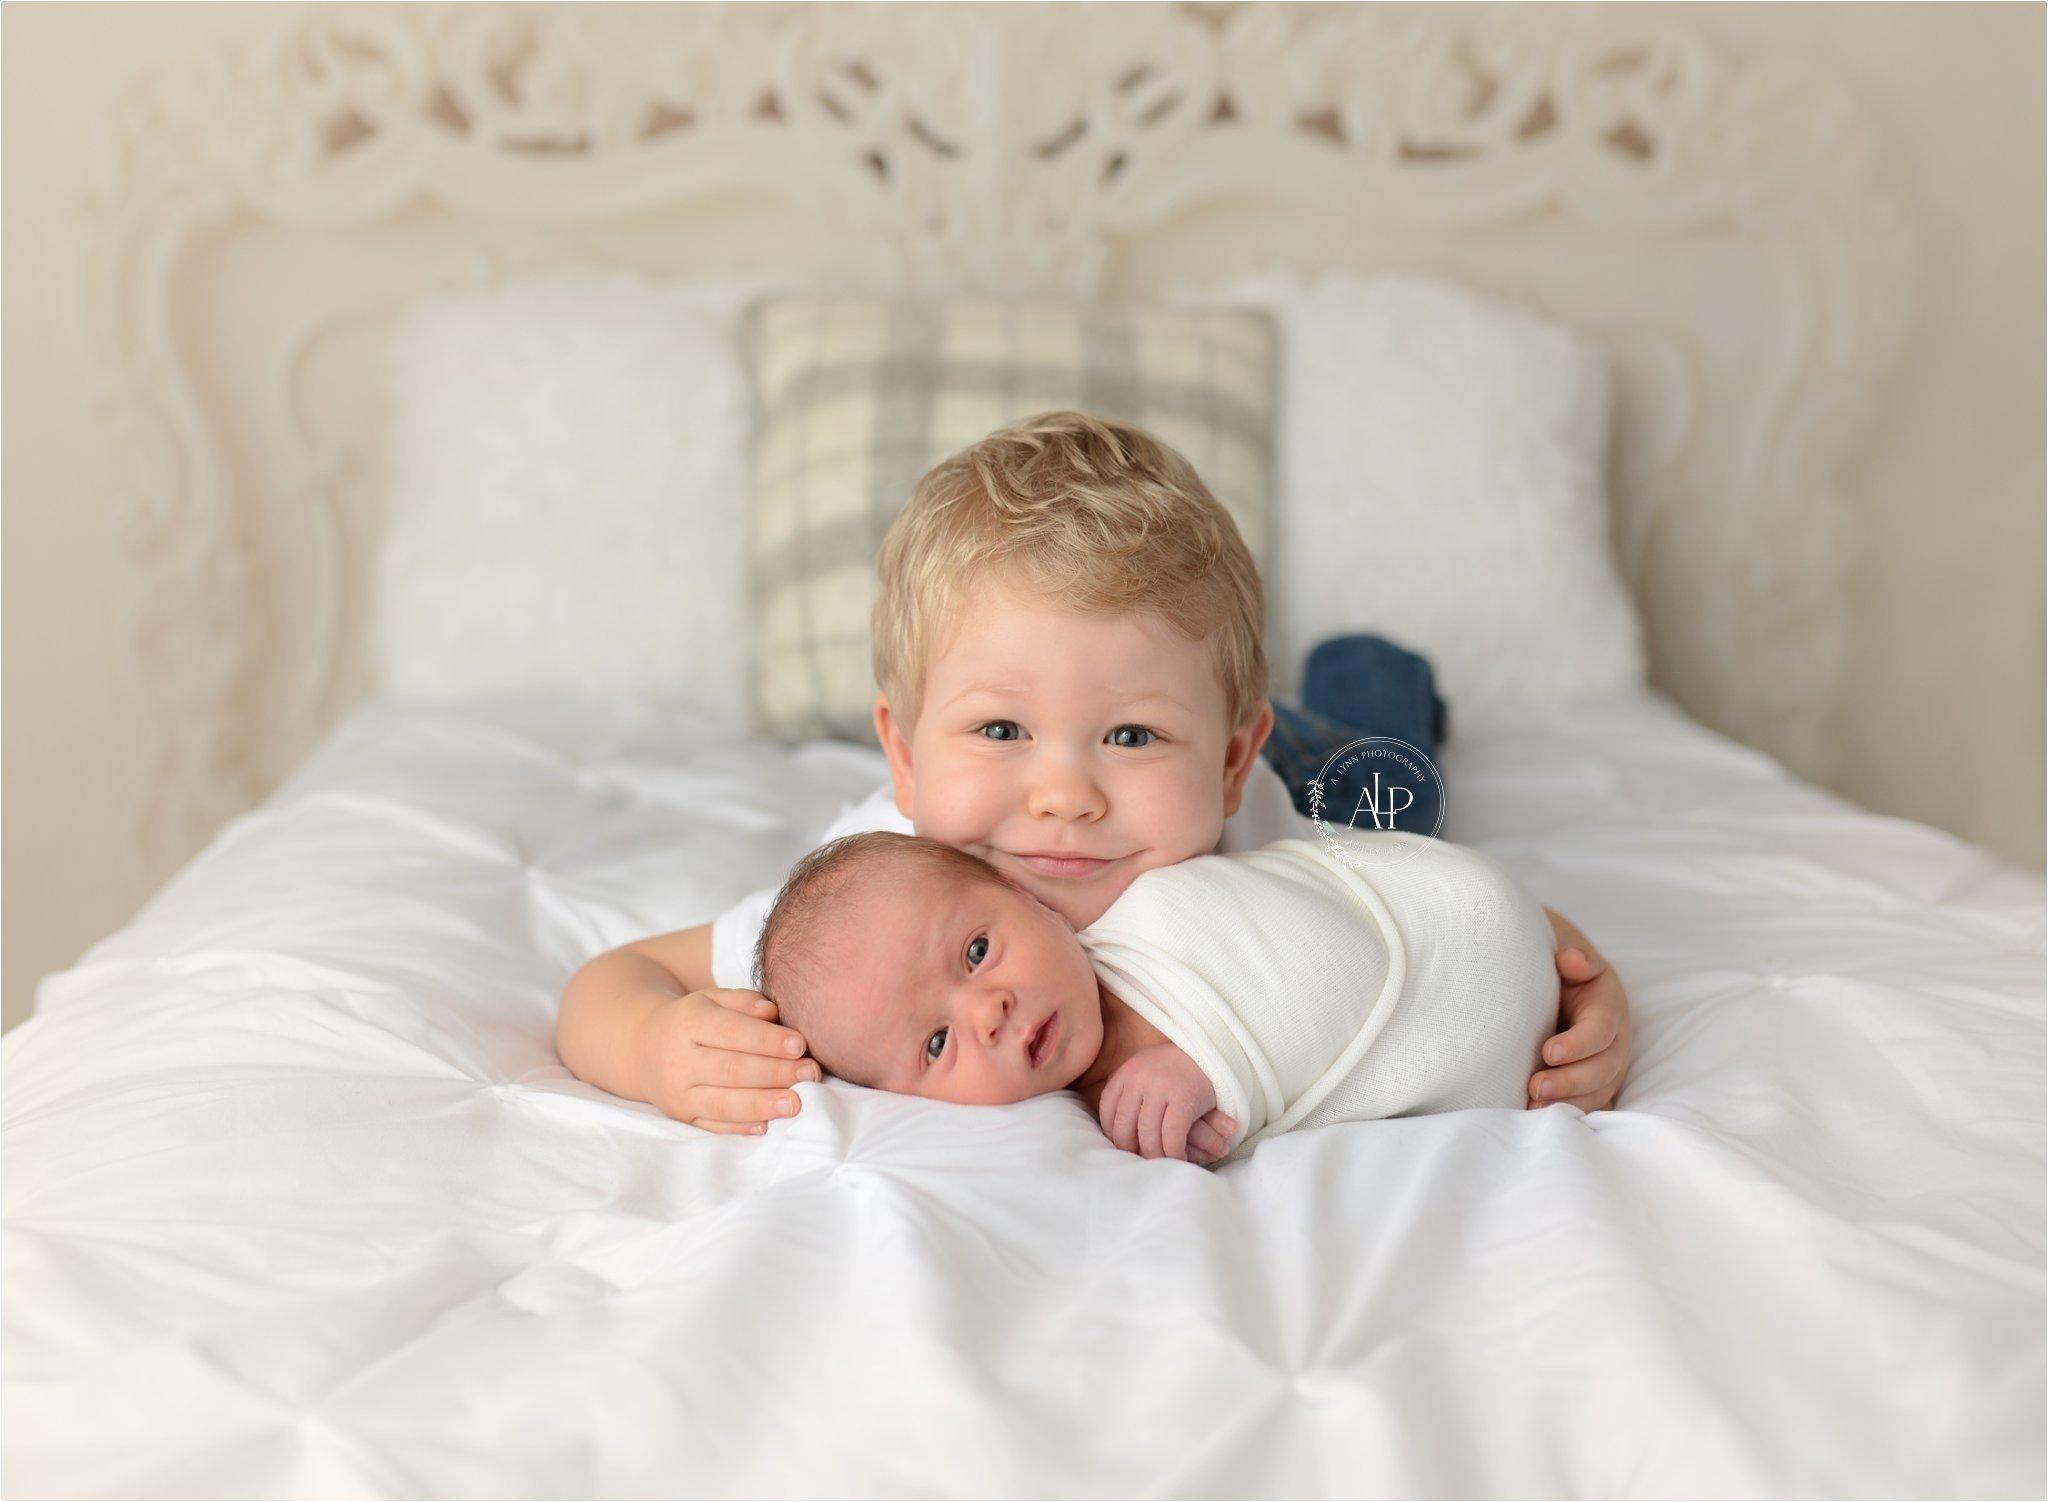 10 Stylish Newborn Photo Ideas With Siblings newborn with sibling brothers newborn poses newborn posesa